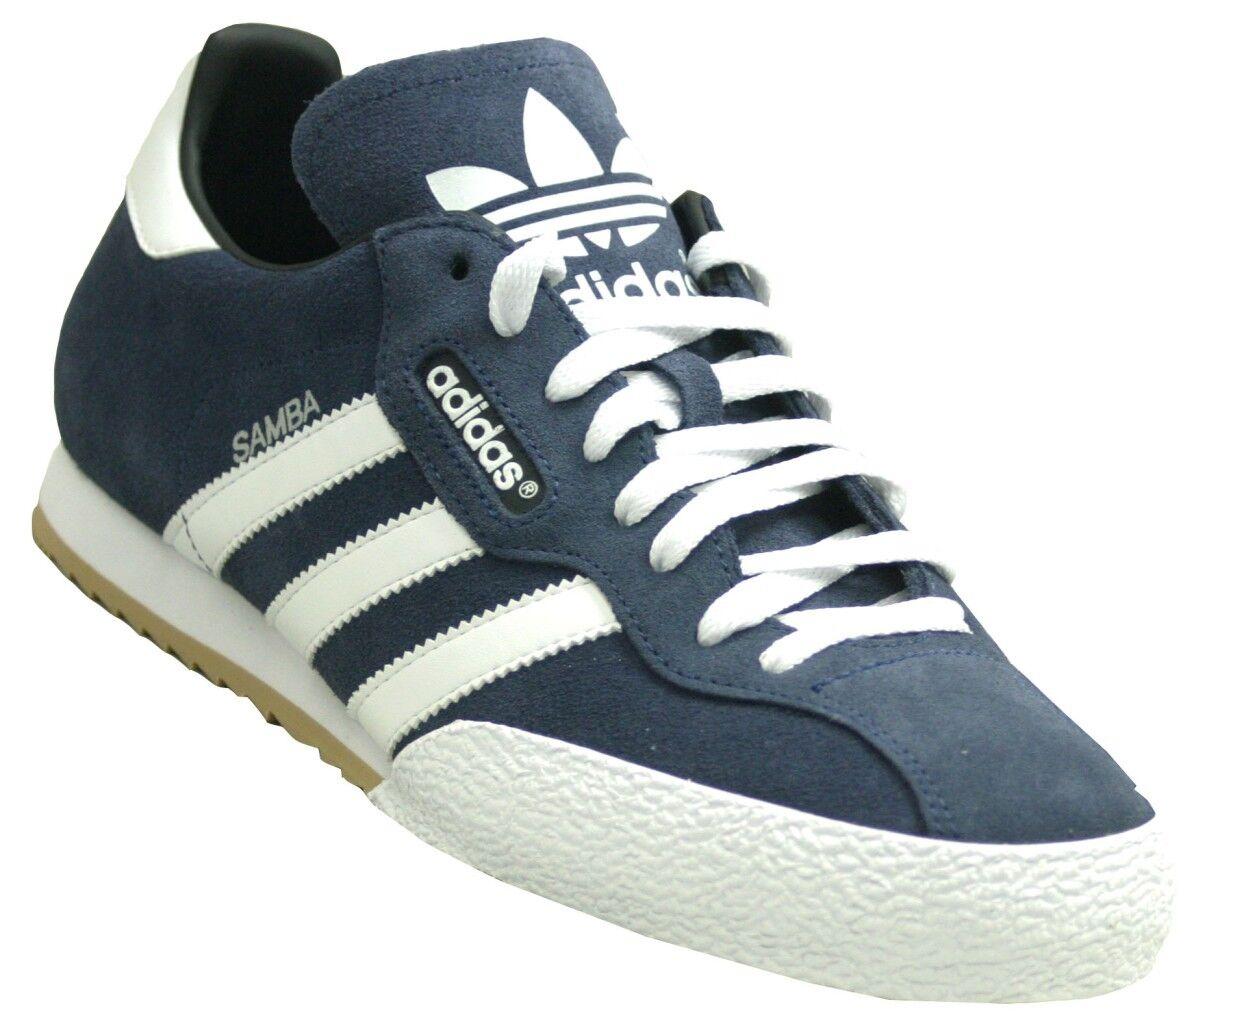 adidas Samba Mens Originals Trainers Navy Blue Suede Retro sizes 7-12   019332 Seasonal clearance sale